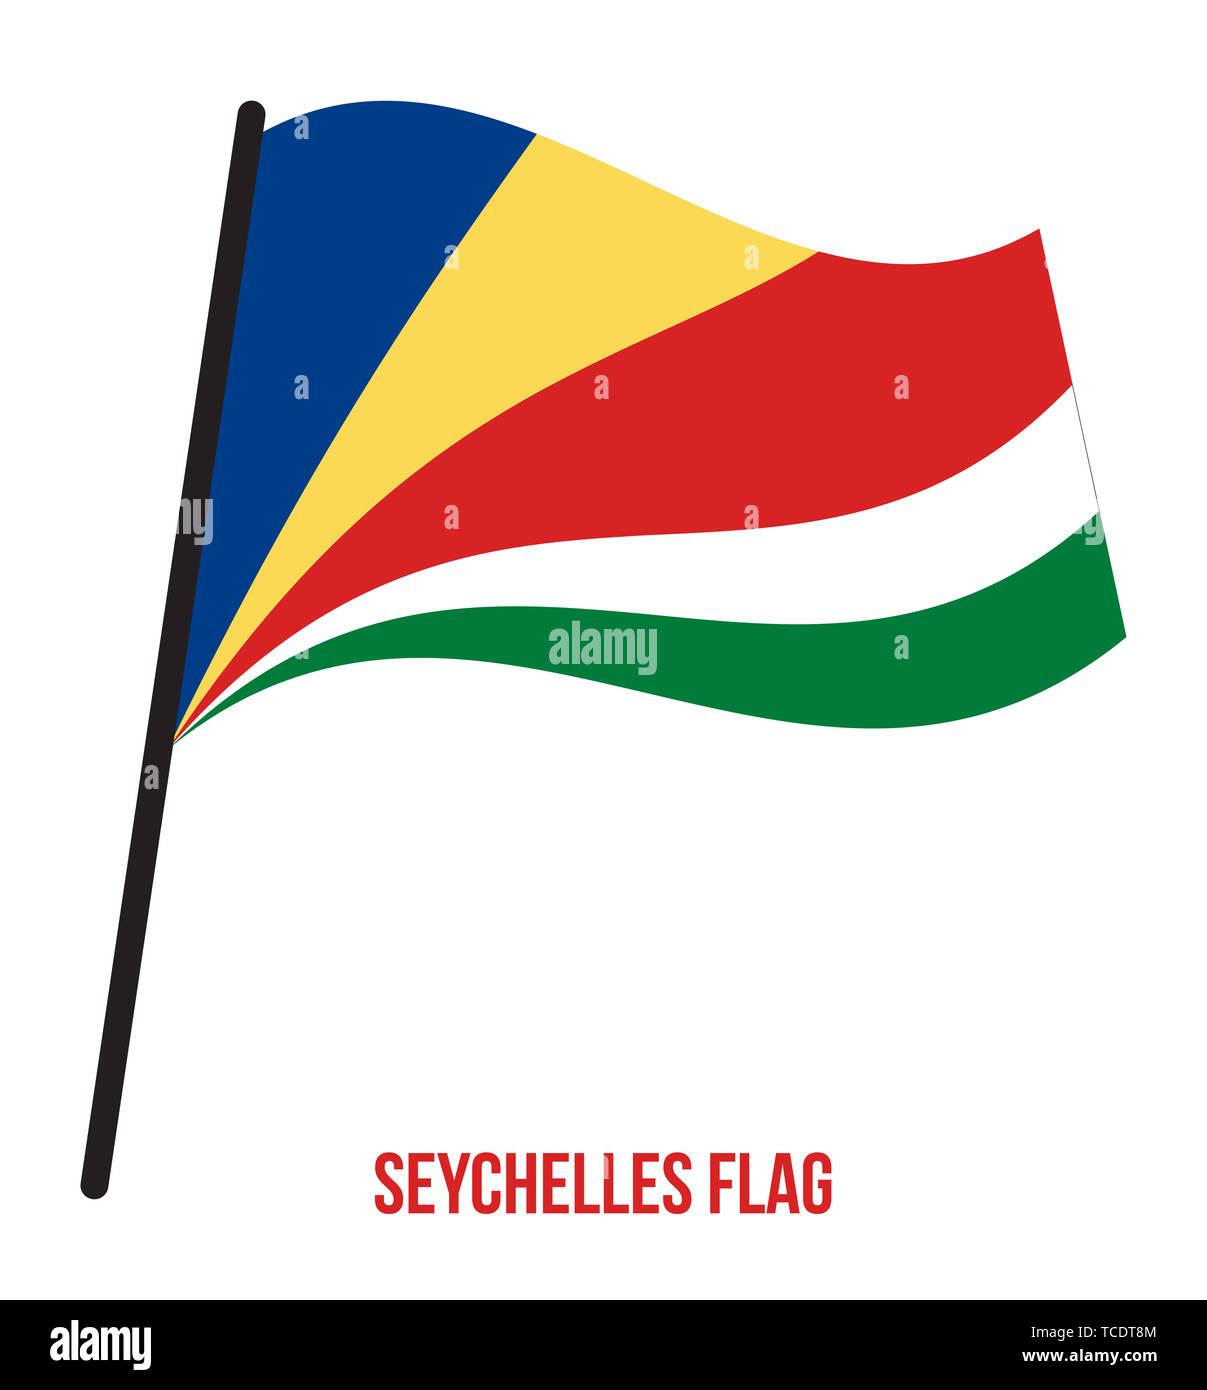 Seychelles Flag Waving Vector Illustration on White Background. Seychelles National Flag. - Stock Image